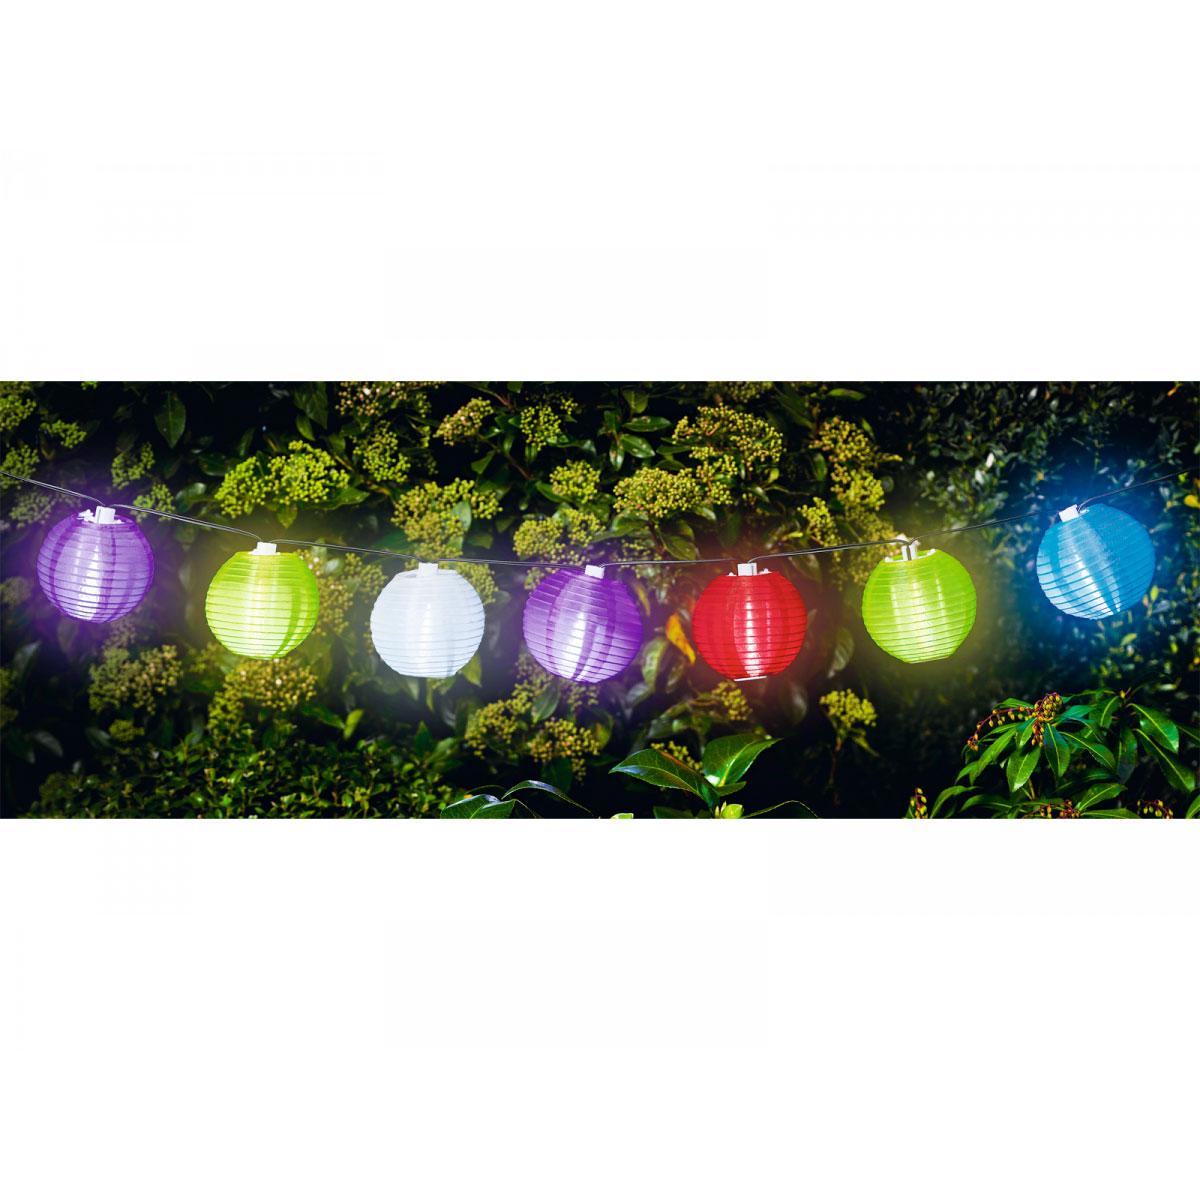 "Flector Garten Solar-Lichterkette ""Lampions"", mehrfarbig"